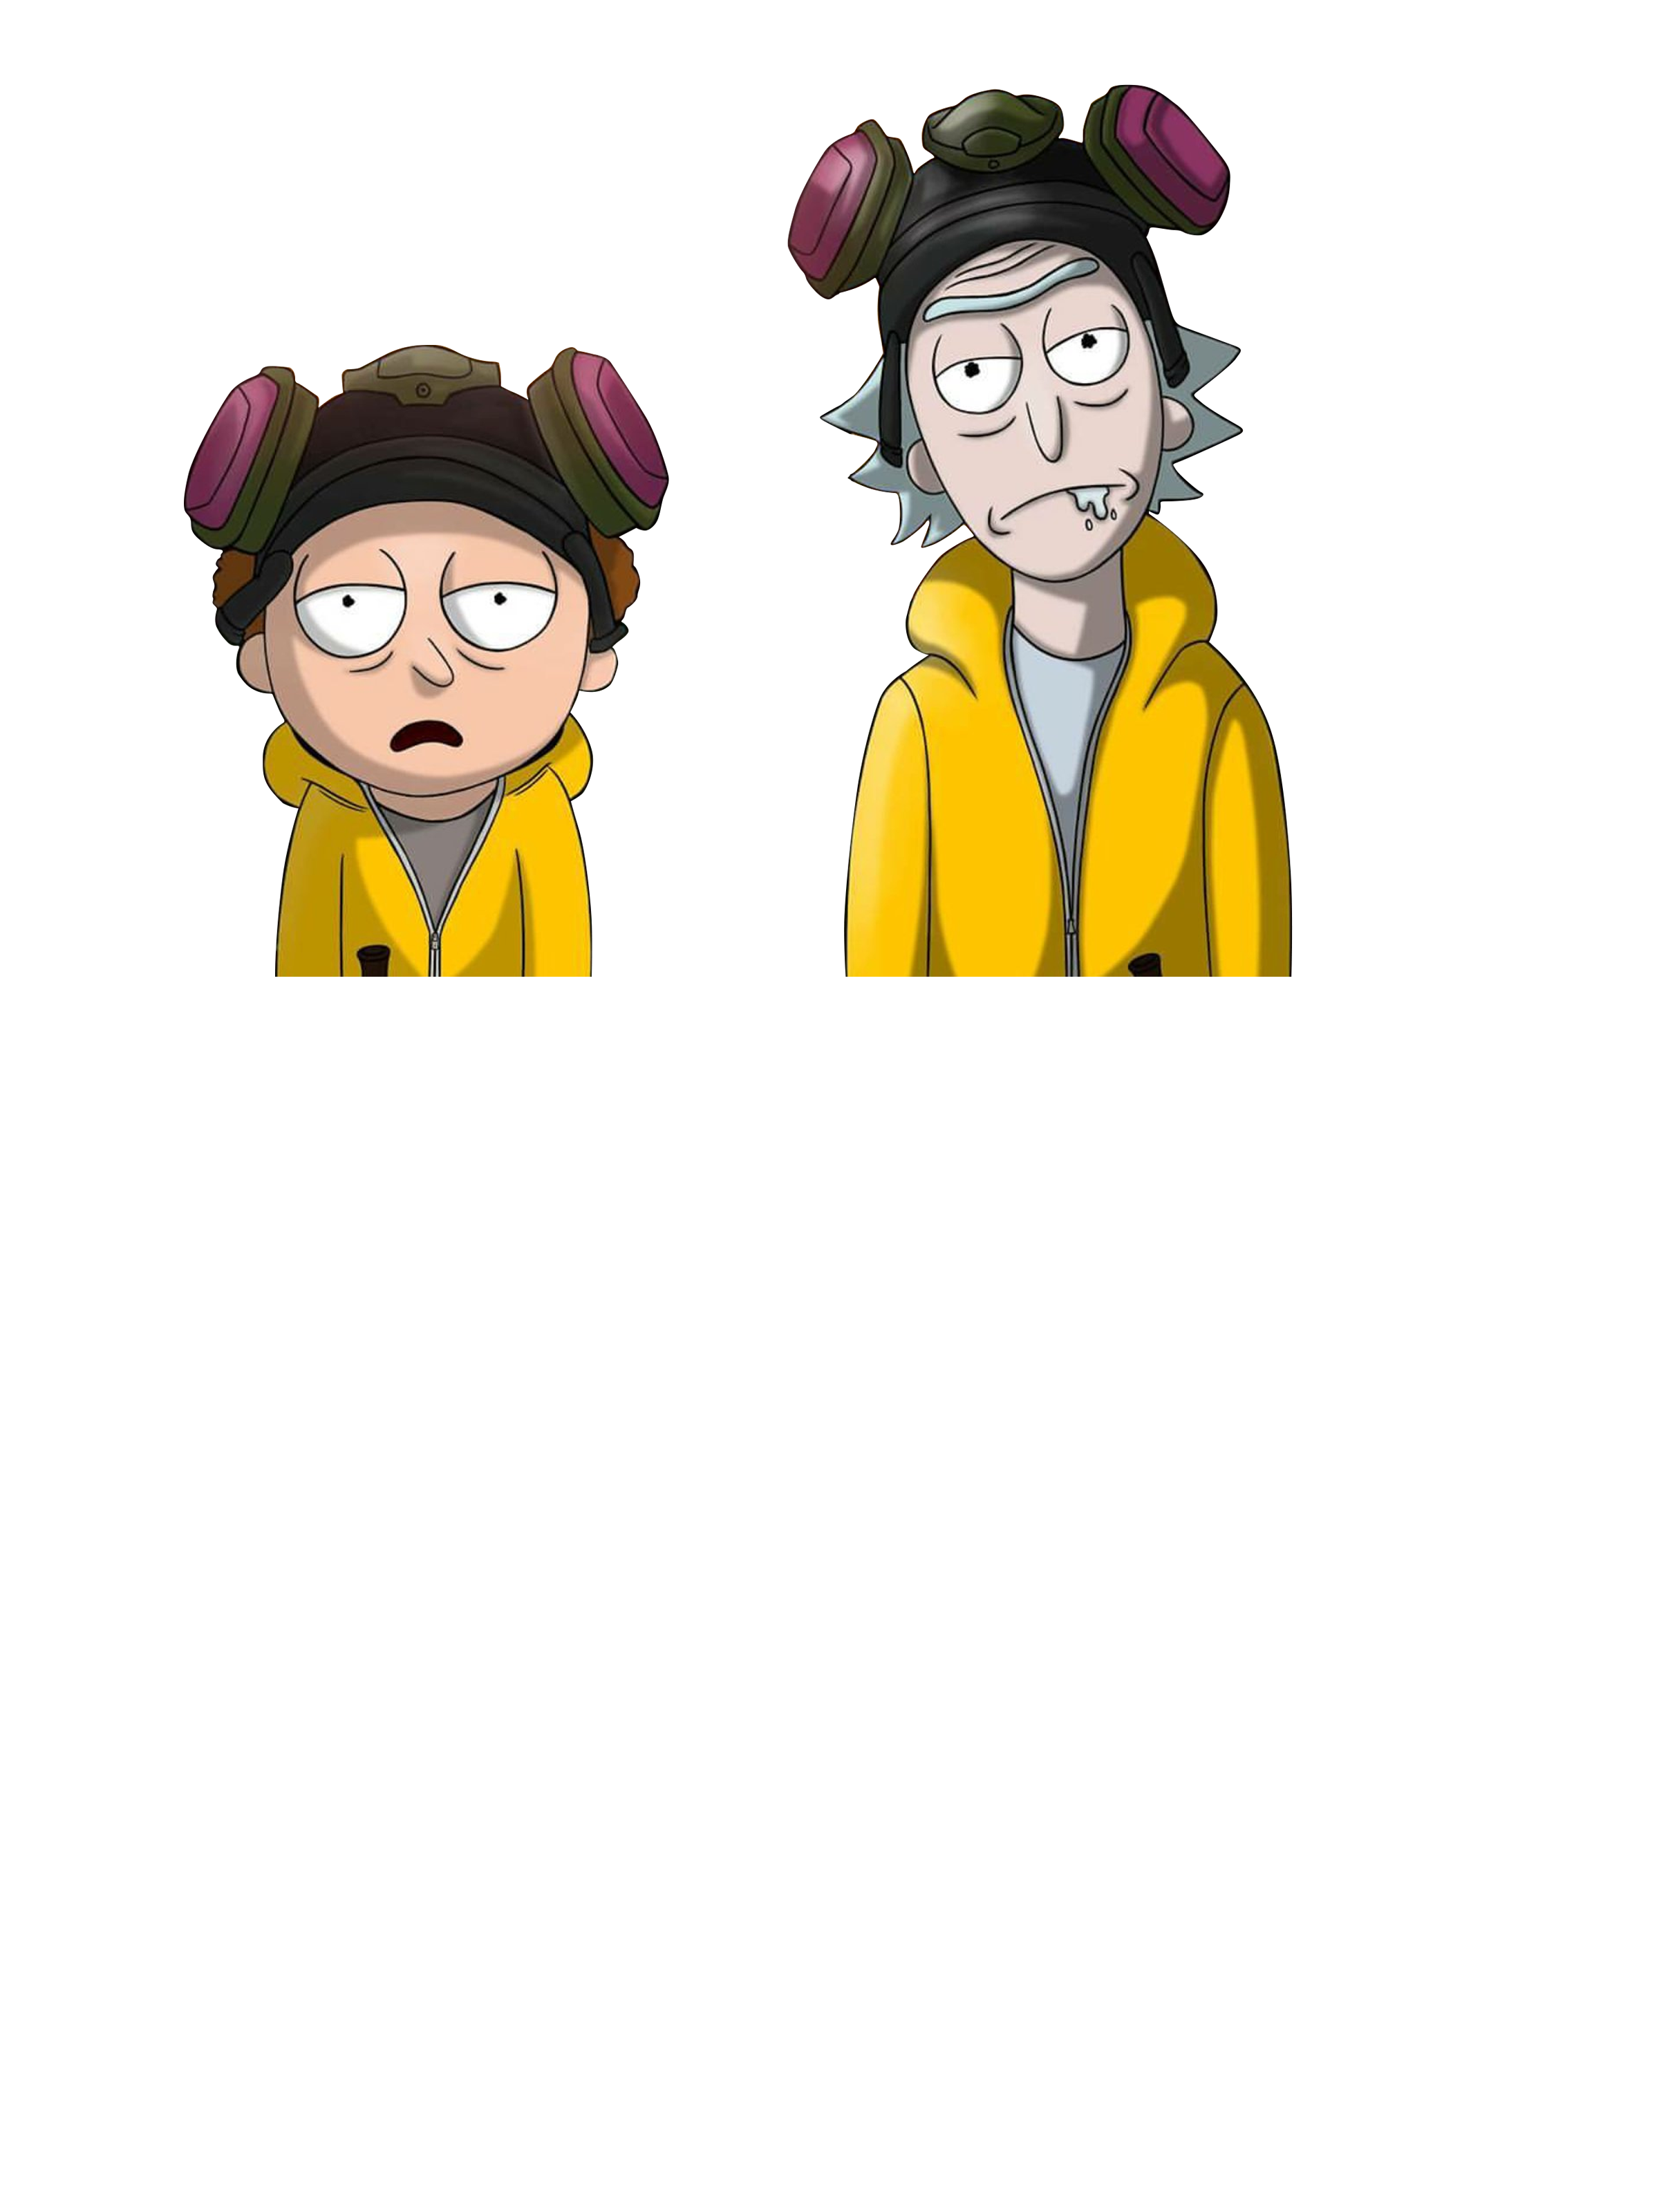 Pin De Wini Jin En Rick And Morty Personajes De Rick Y Morty Rick Y Morty Dibujo Grafico